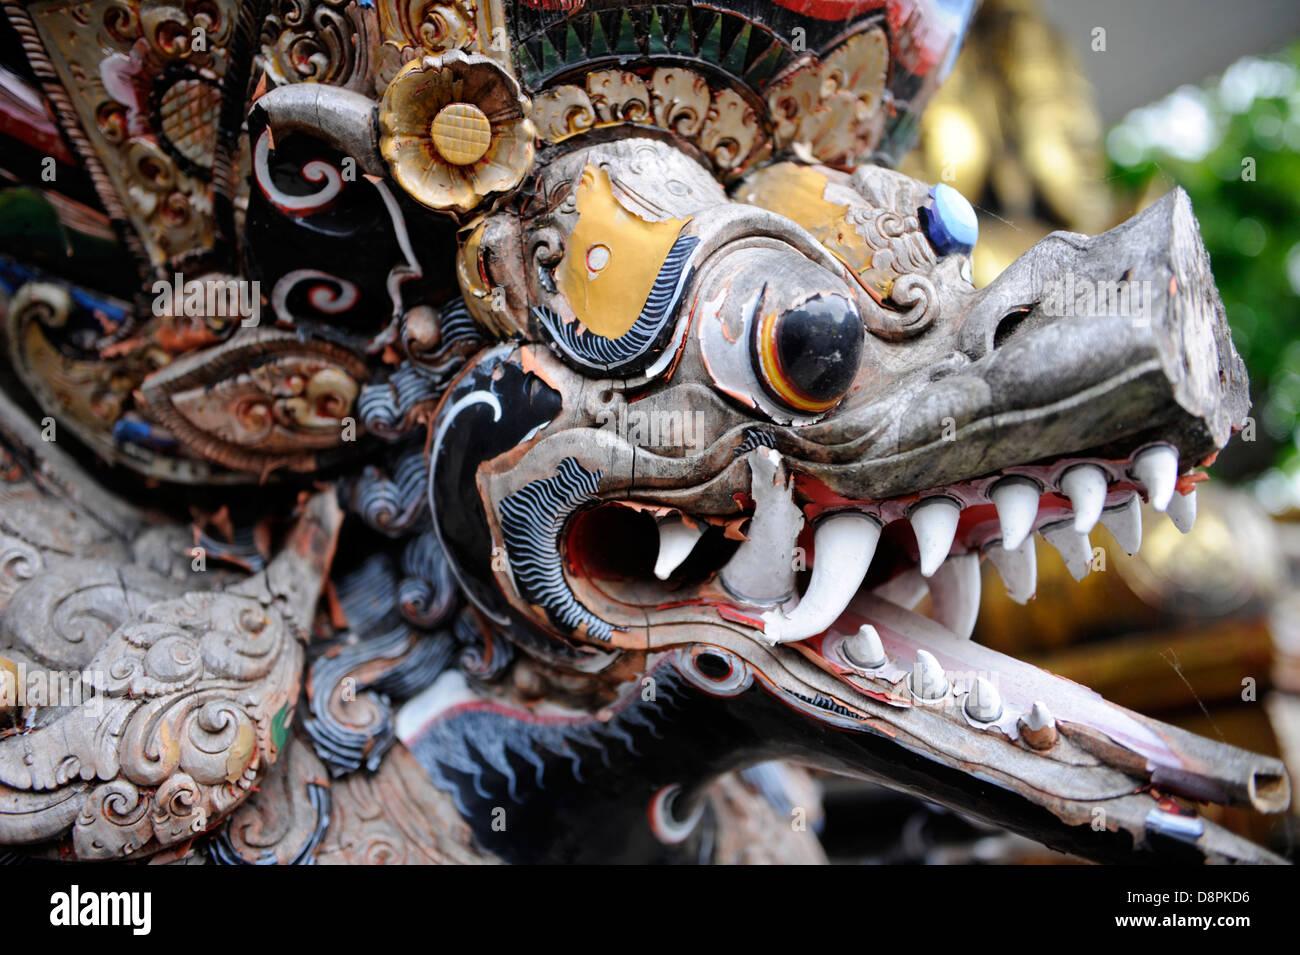 Vintage Asian Dragon statue wooden statuary art artwork - Stock Image